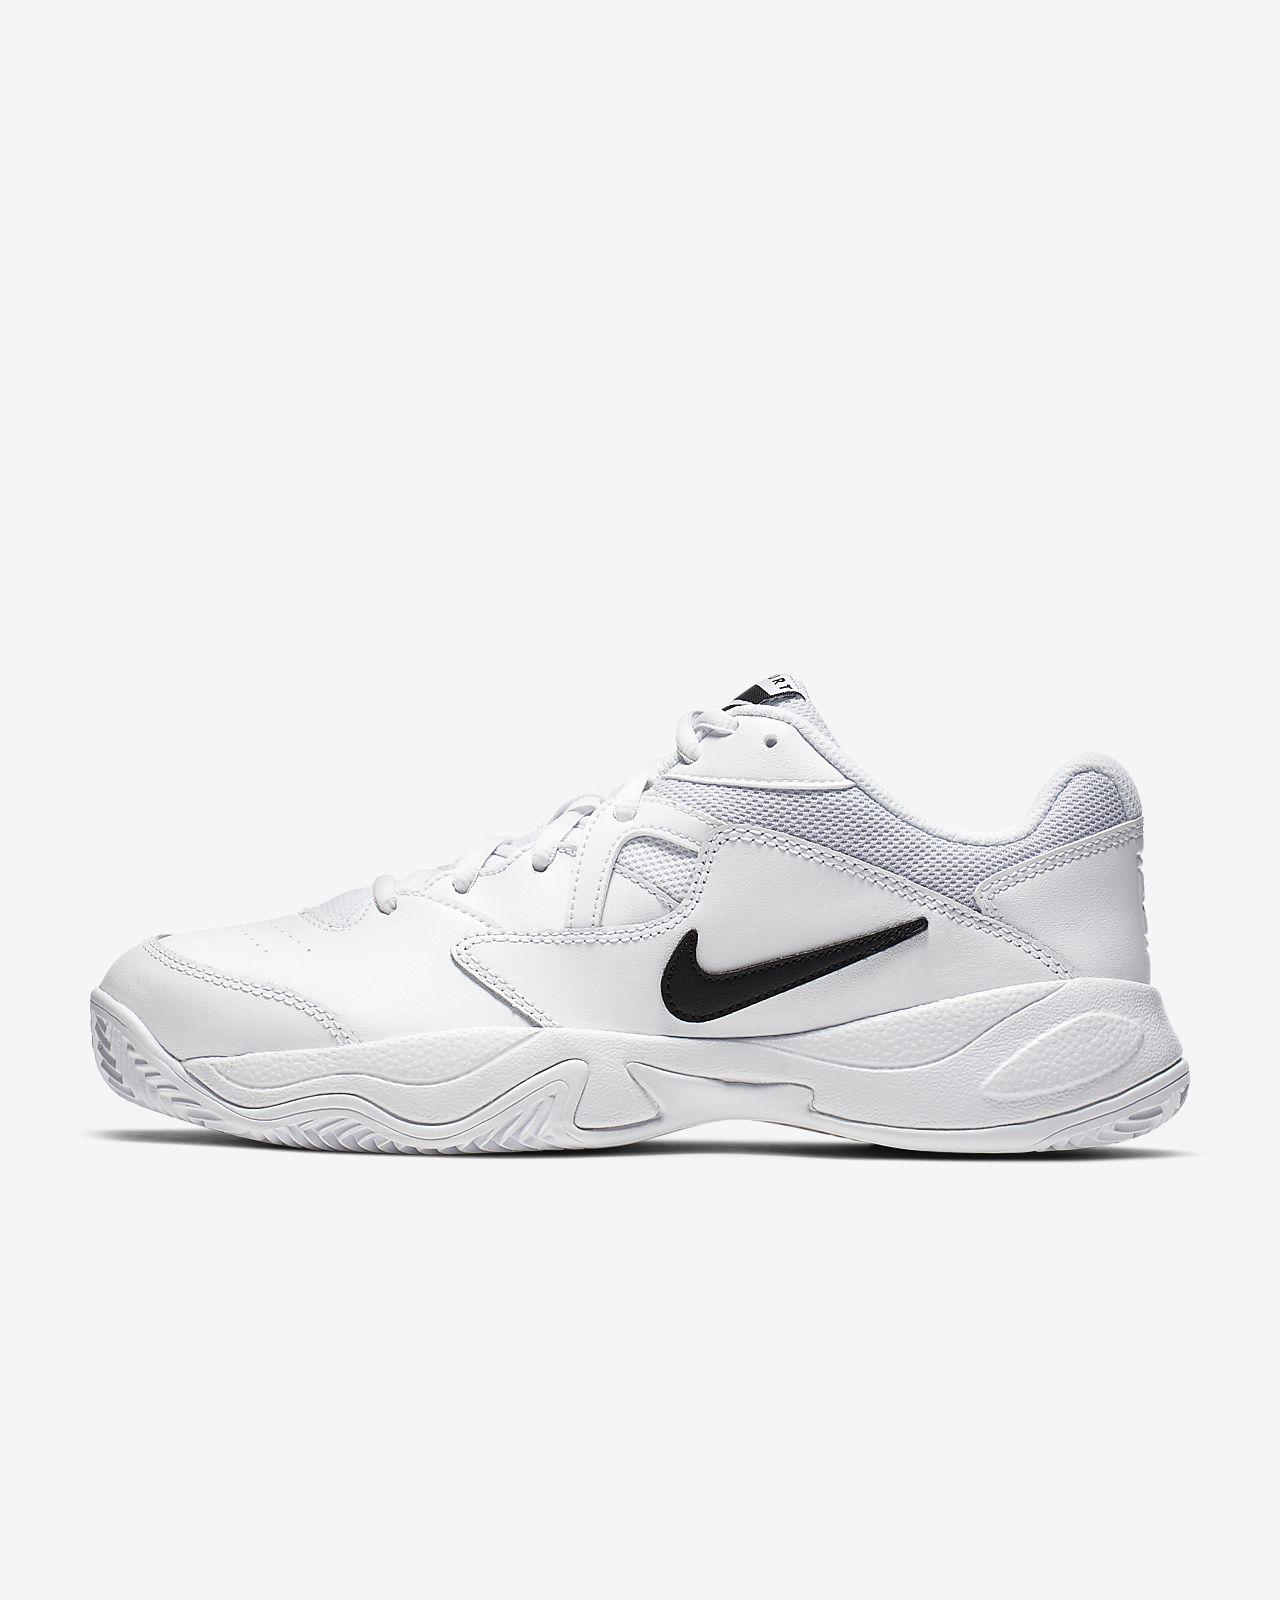 factory authentic 99586 1312e ... Calzado de tenis para canchas de arcilla para mujer NikeCourt Lite 2